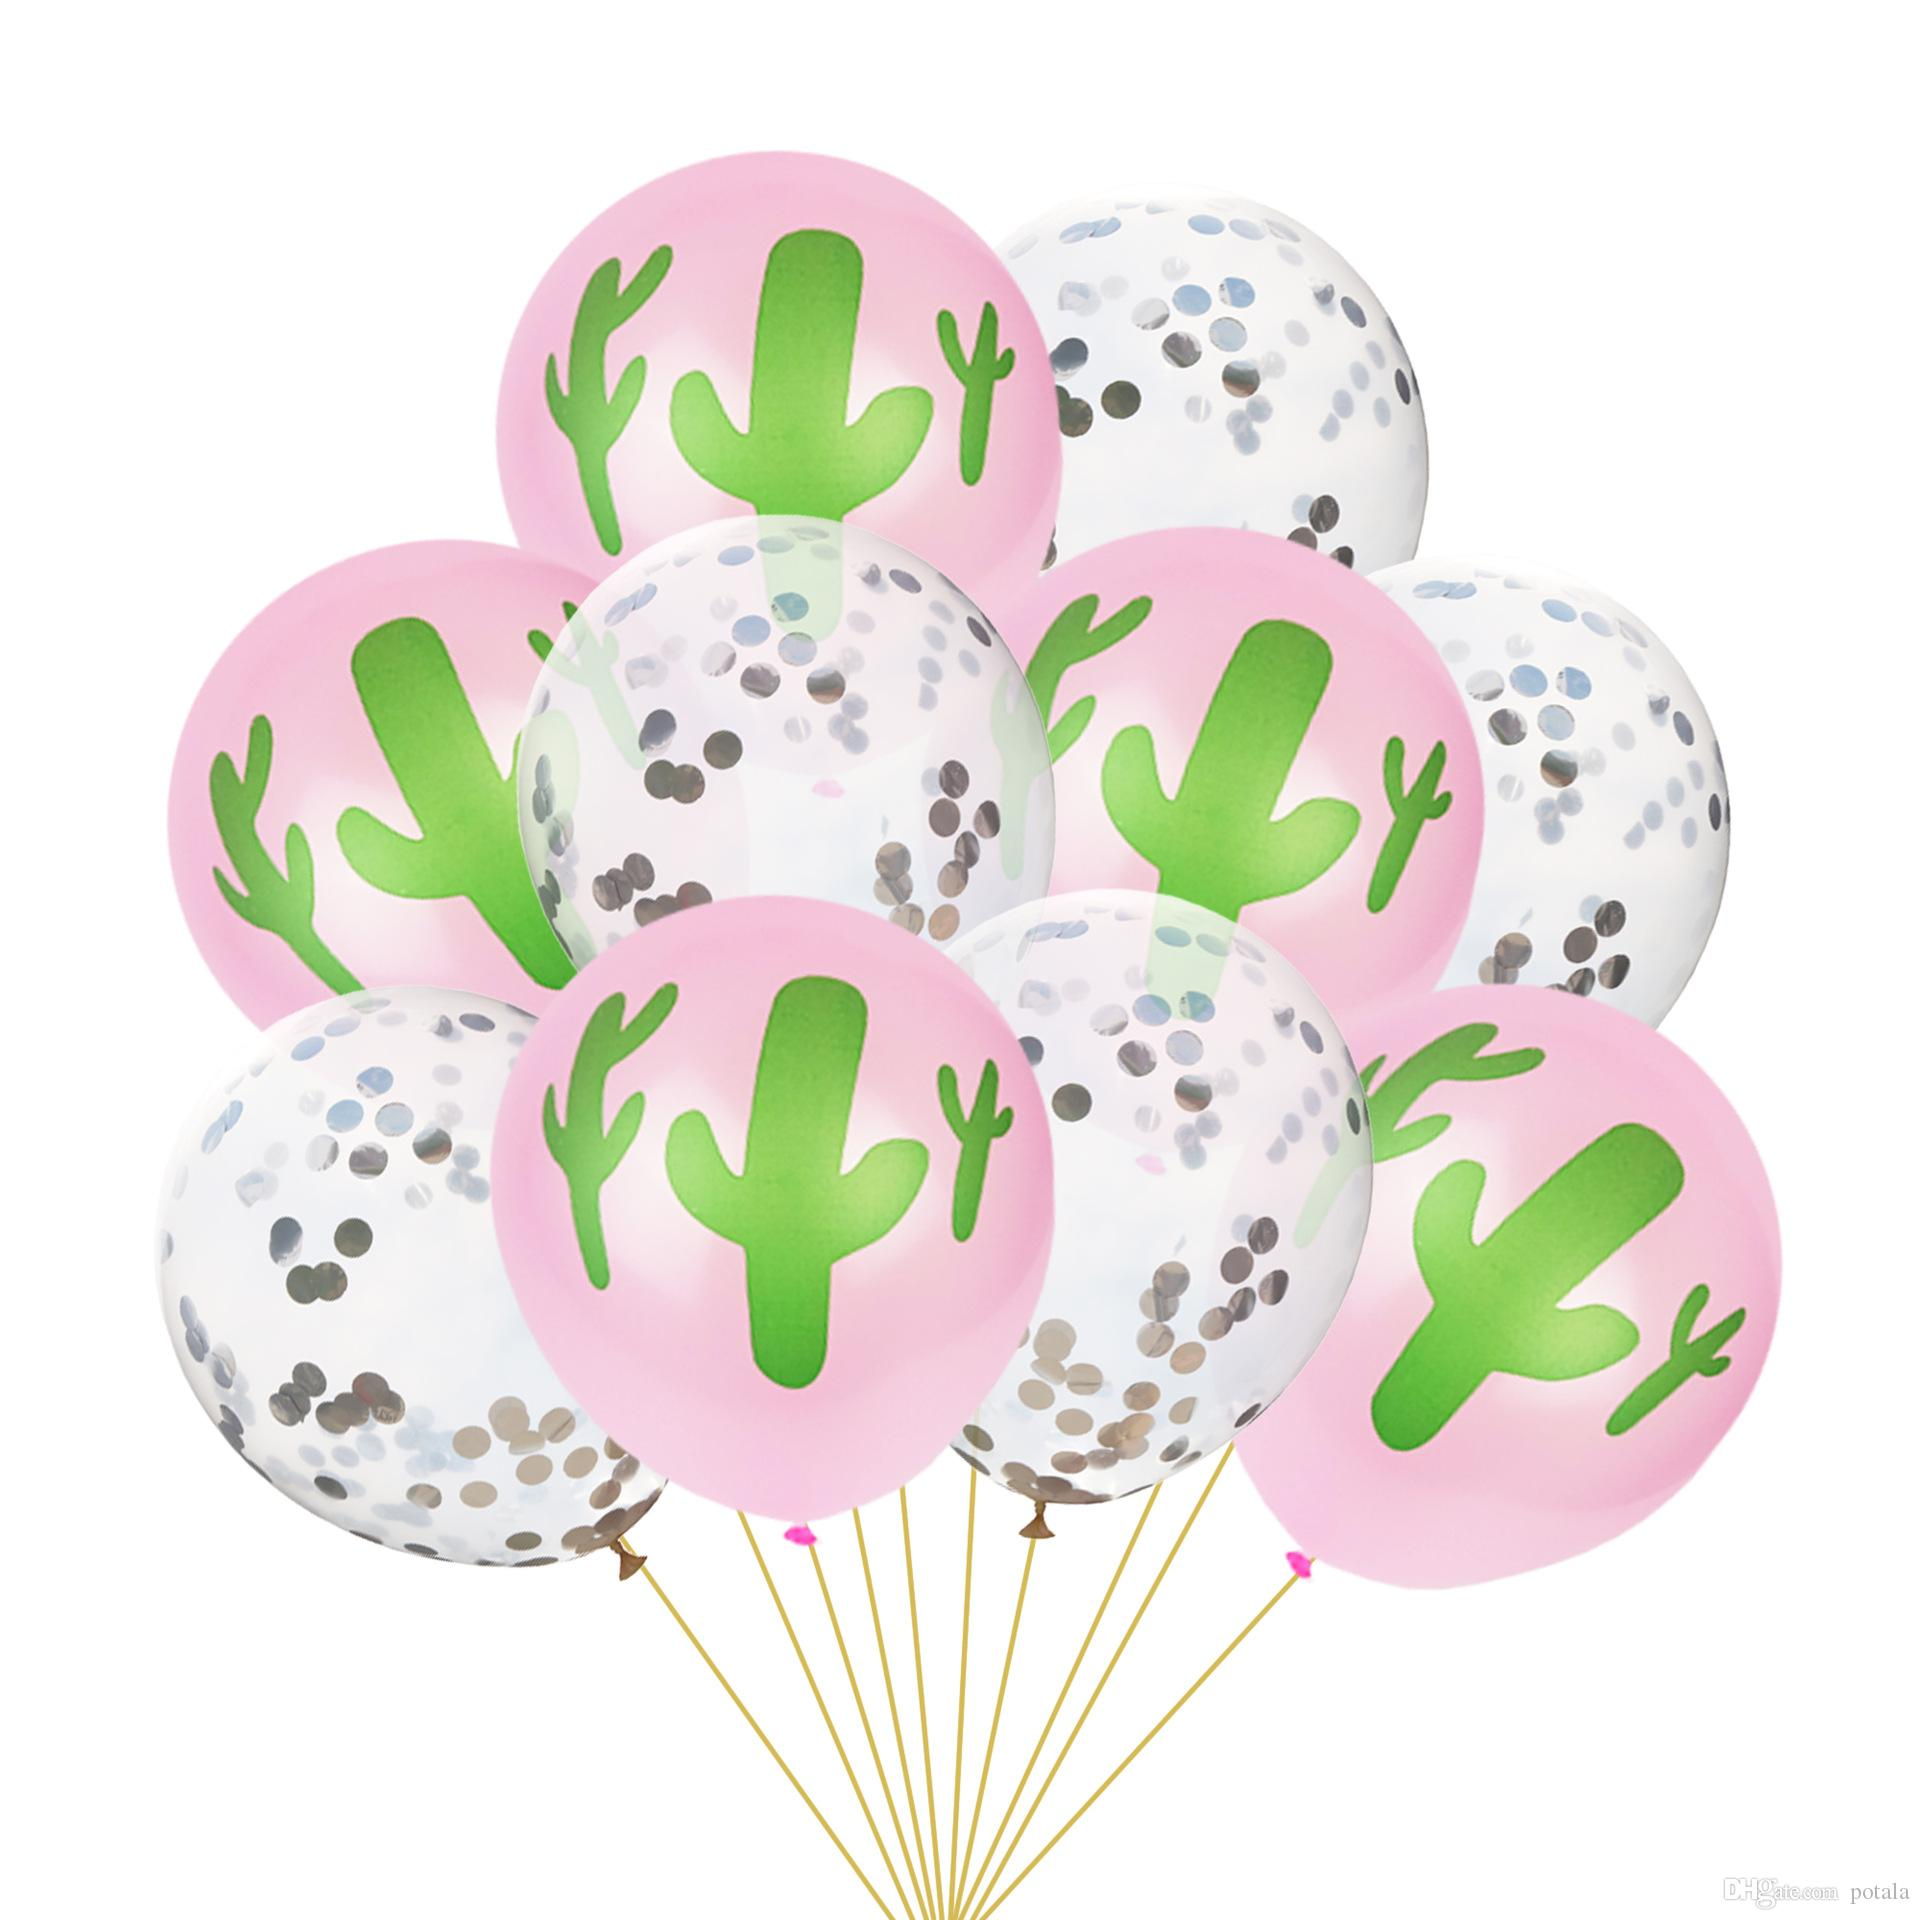 Großhandel 10inch Cactus Balloons12inch Transparente Luftballons